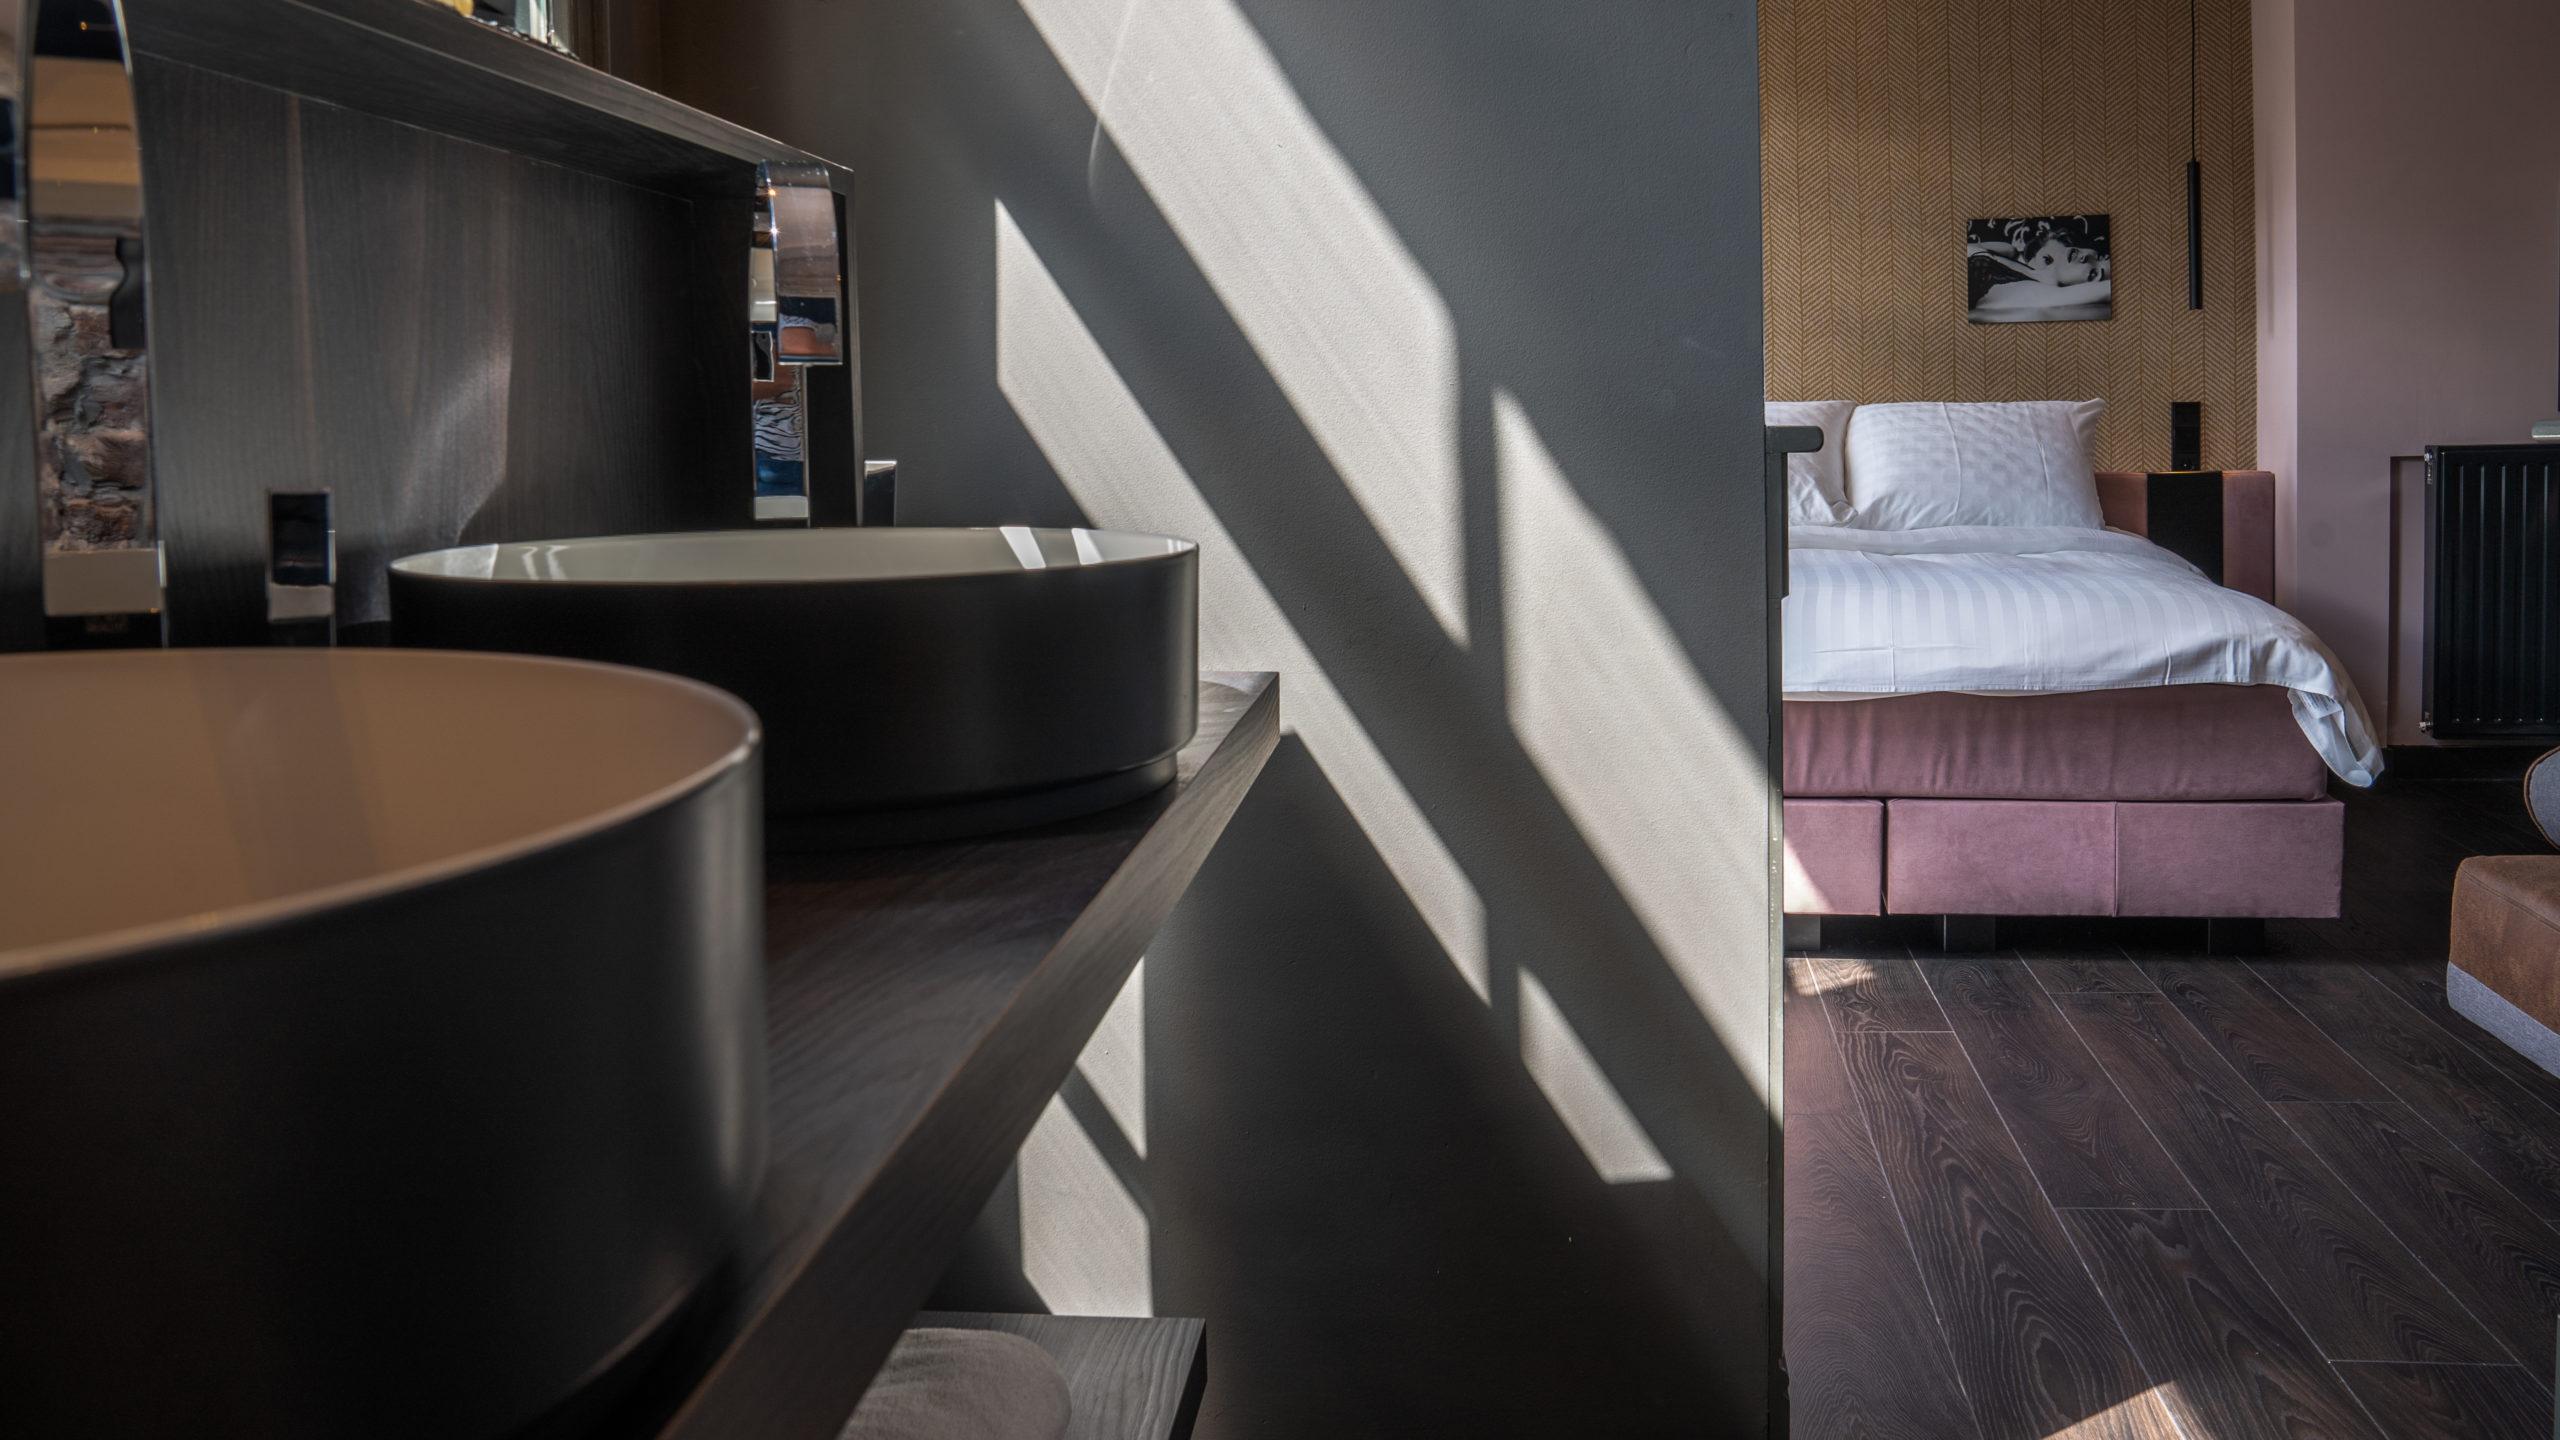 hotel_1666_thorbecke_jeroendenijs_bni_amsterdam_suite_alape